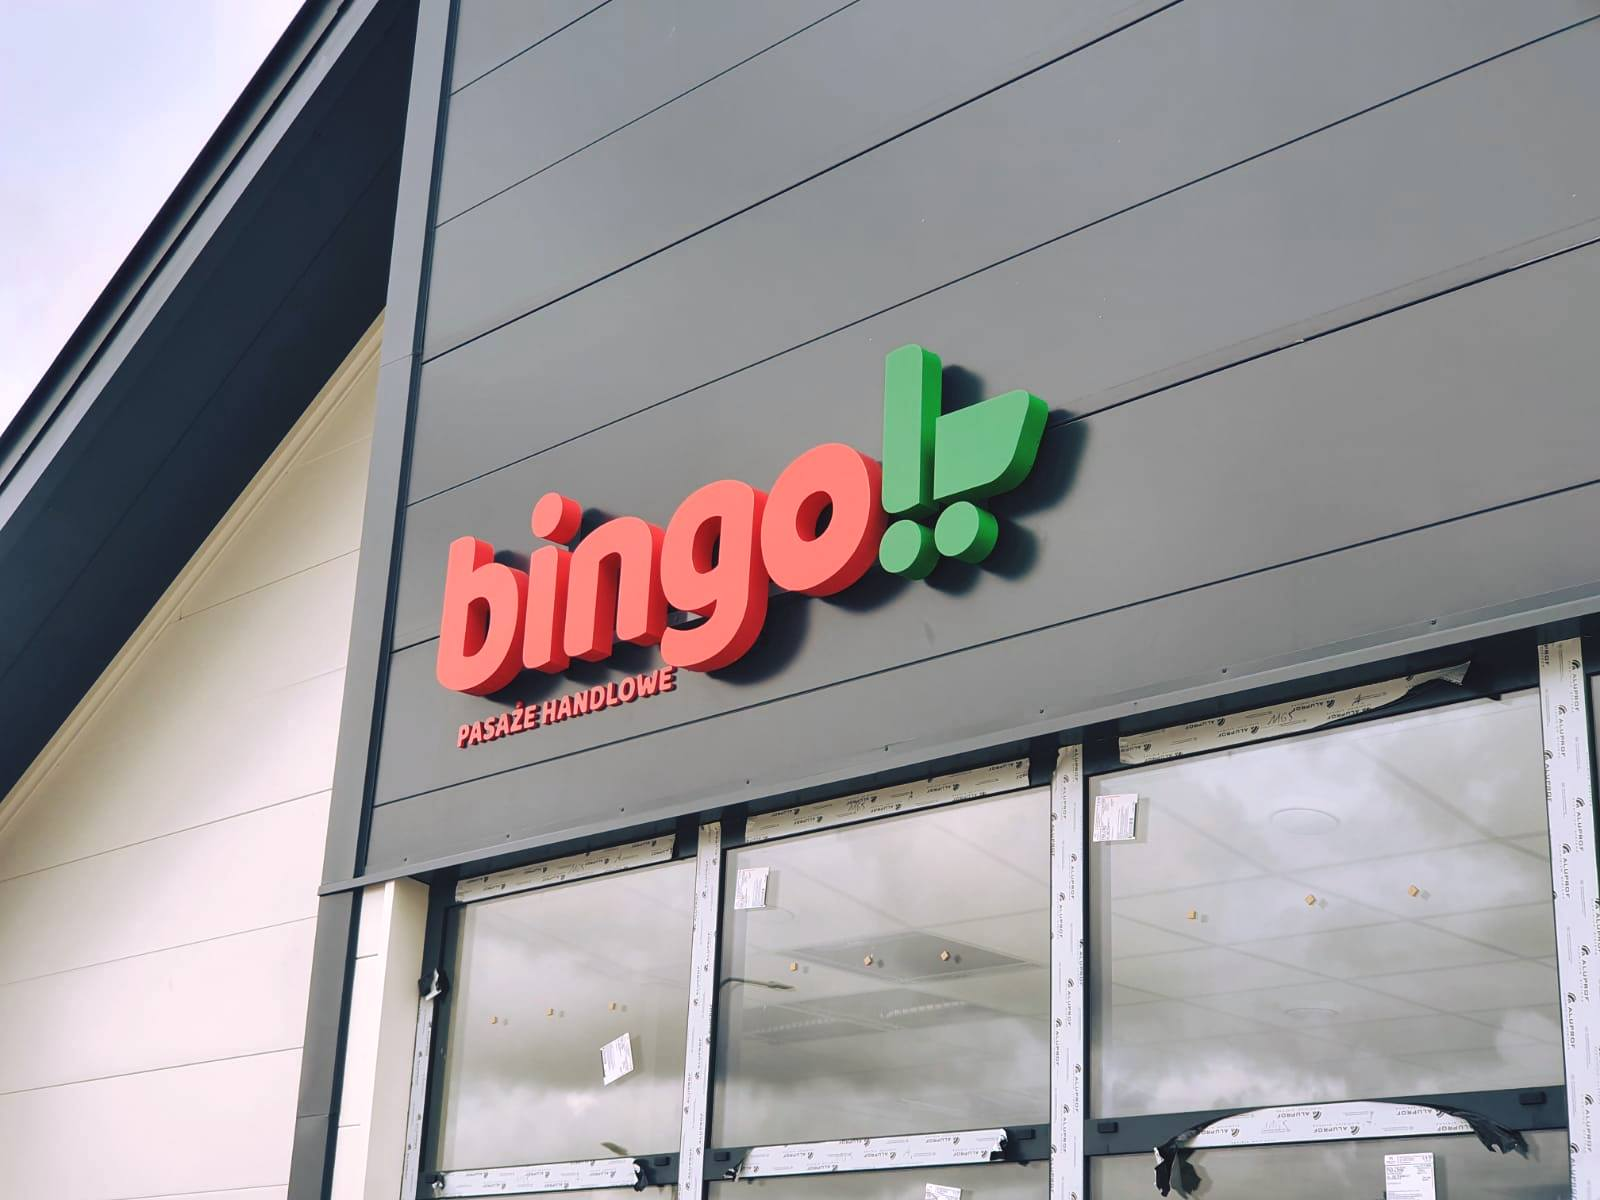 pasaz handlowy Bingo